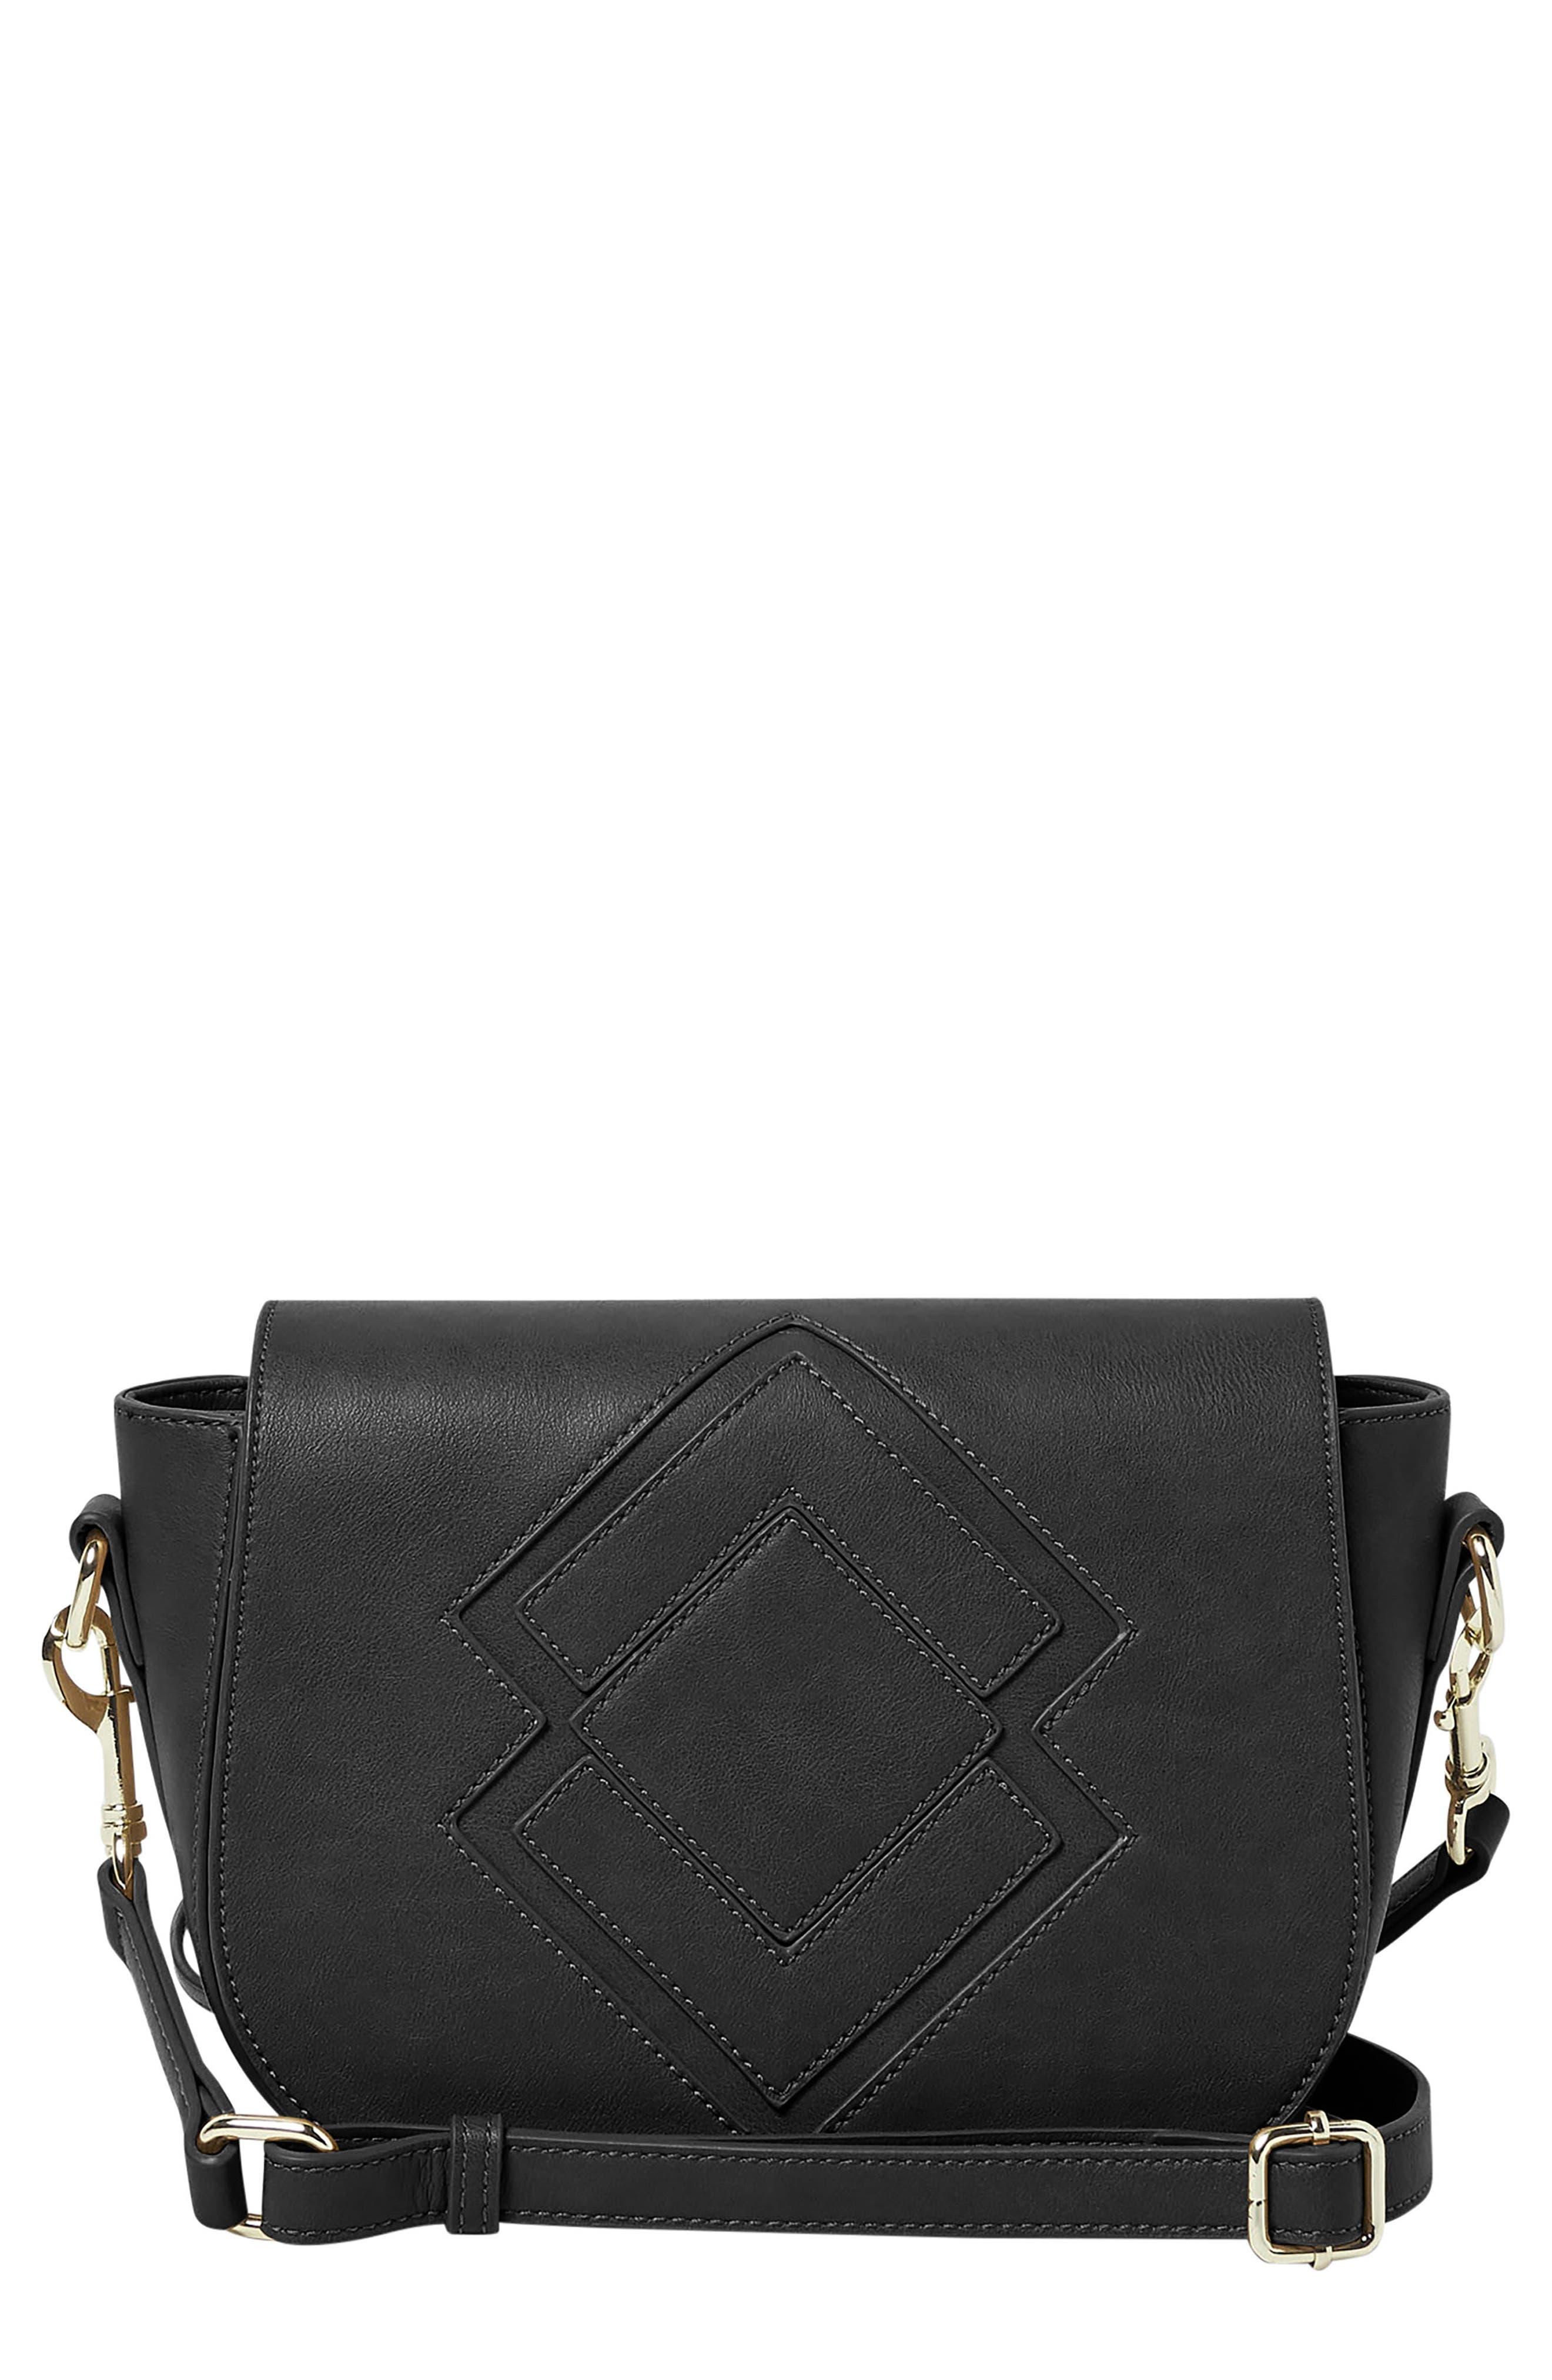 Ventura Vegan Leather Crossbody Bag,                             Main thumbnail 1, color,                             Black